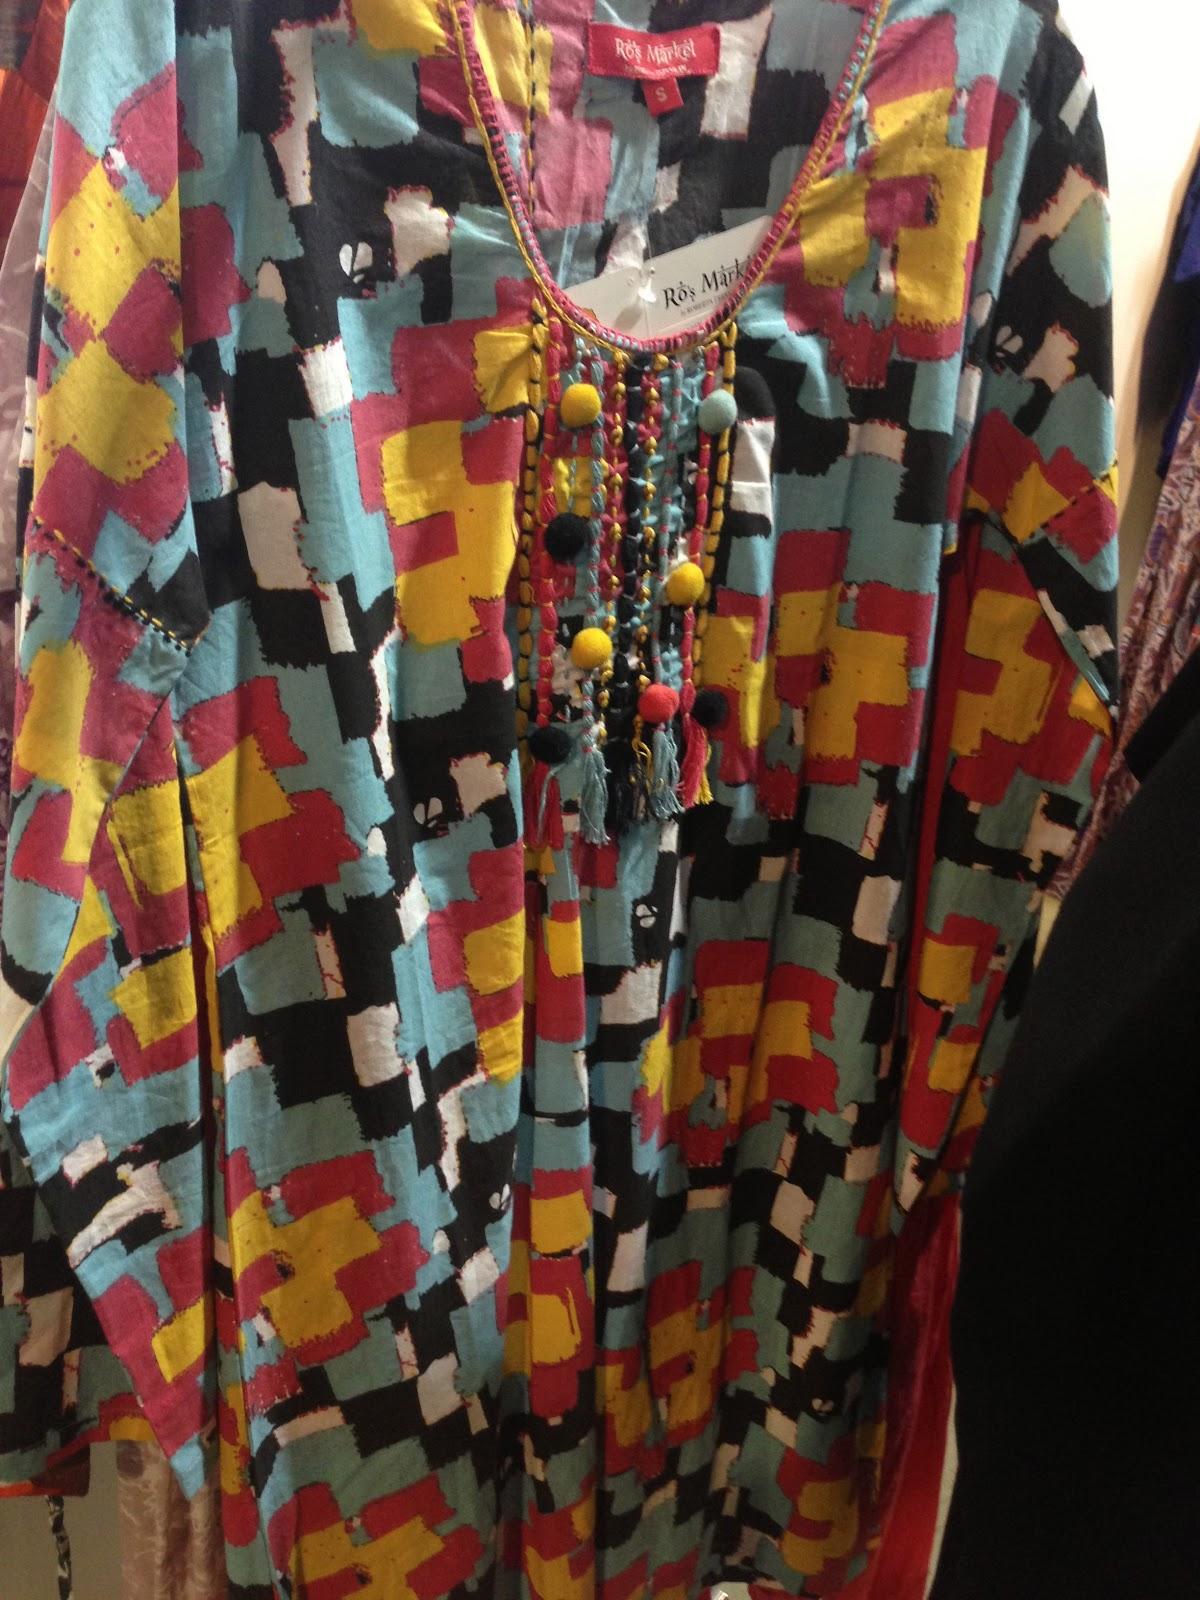 Haute on the Spot: Events: Roberta Freymann Pop-Up Sample Sale